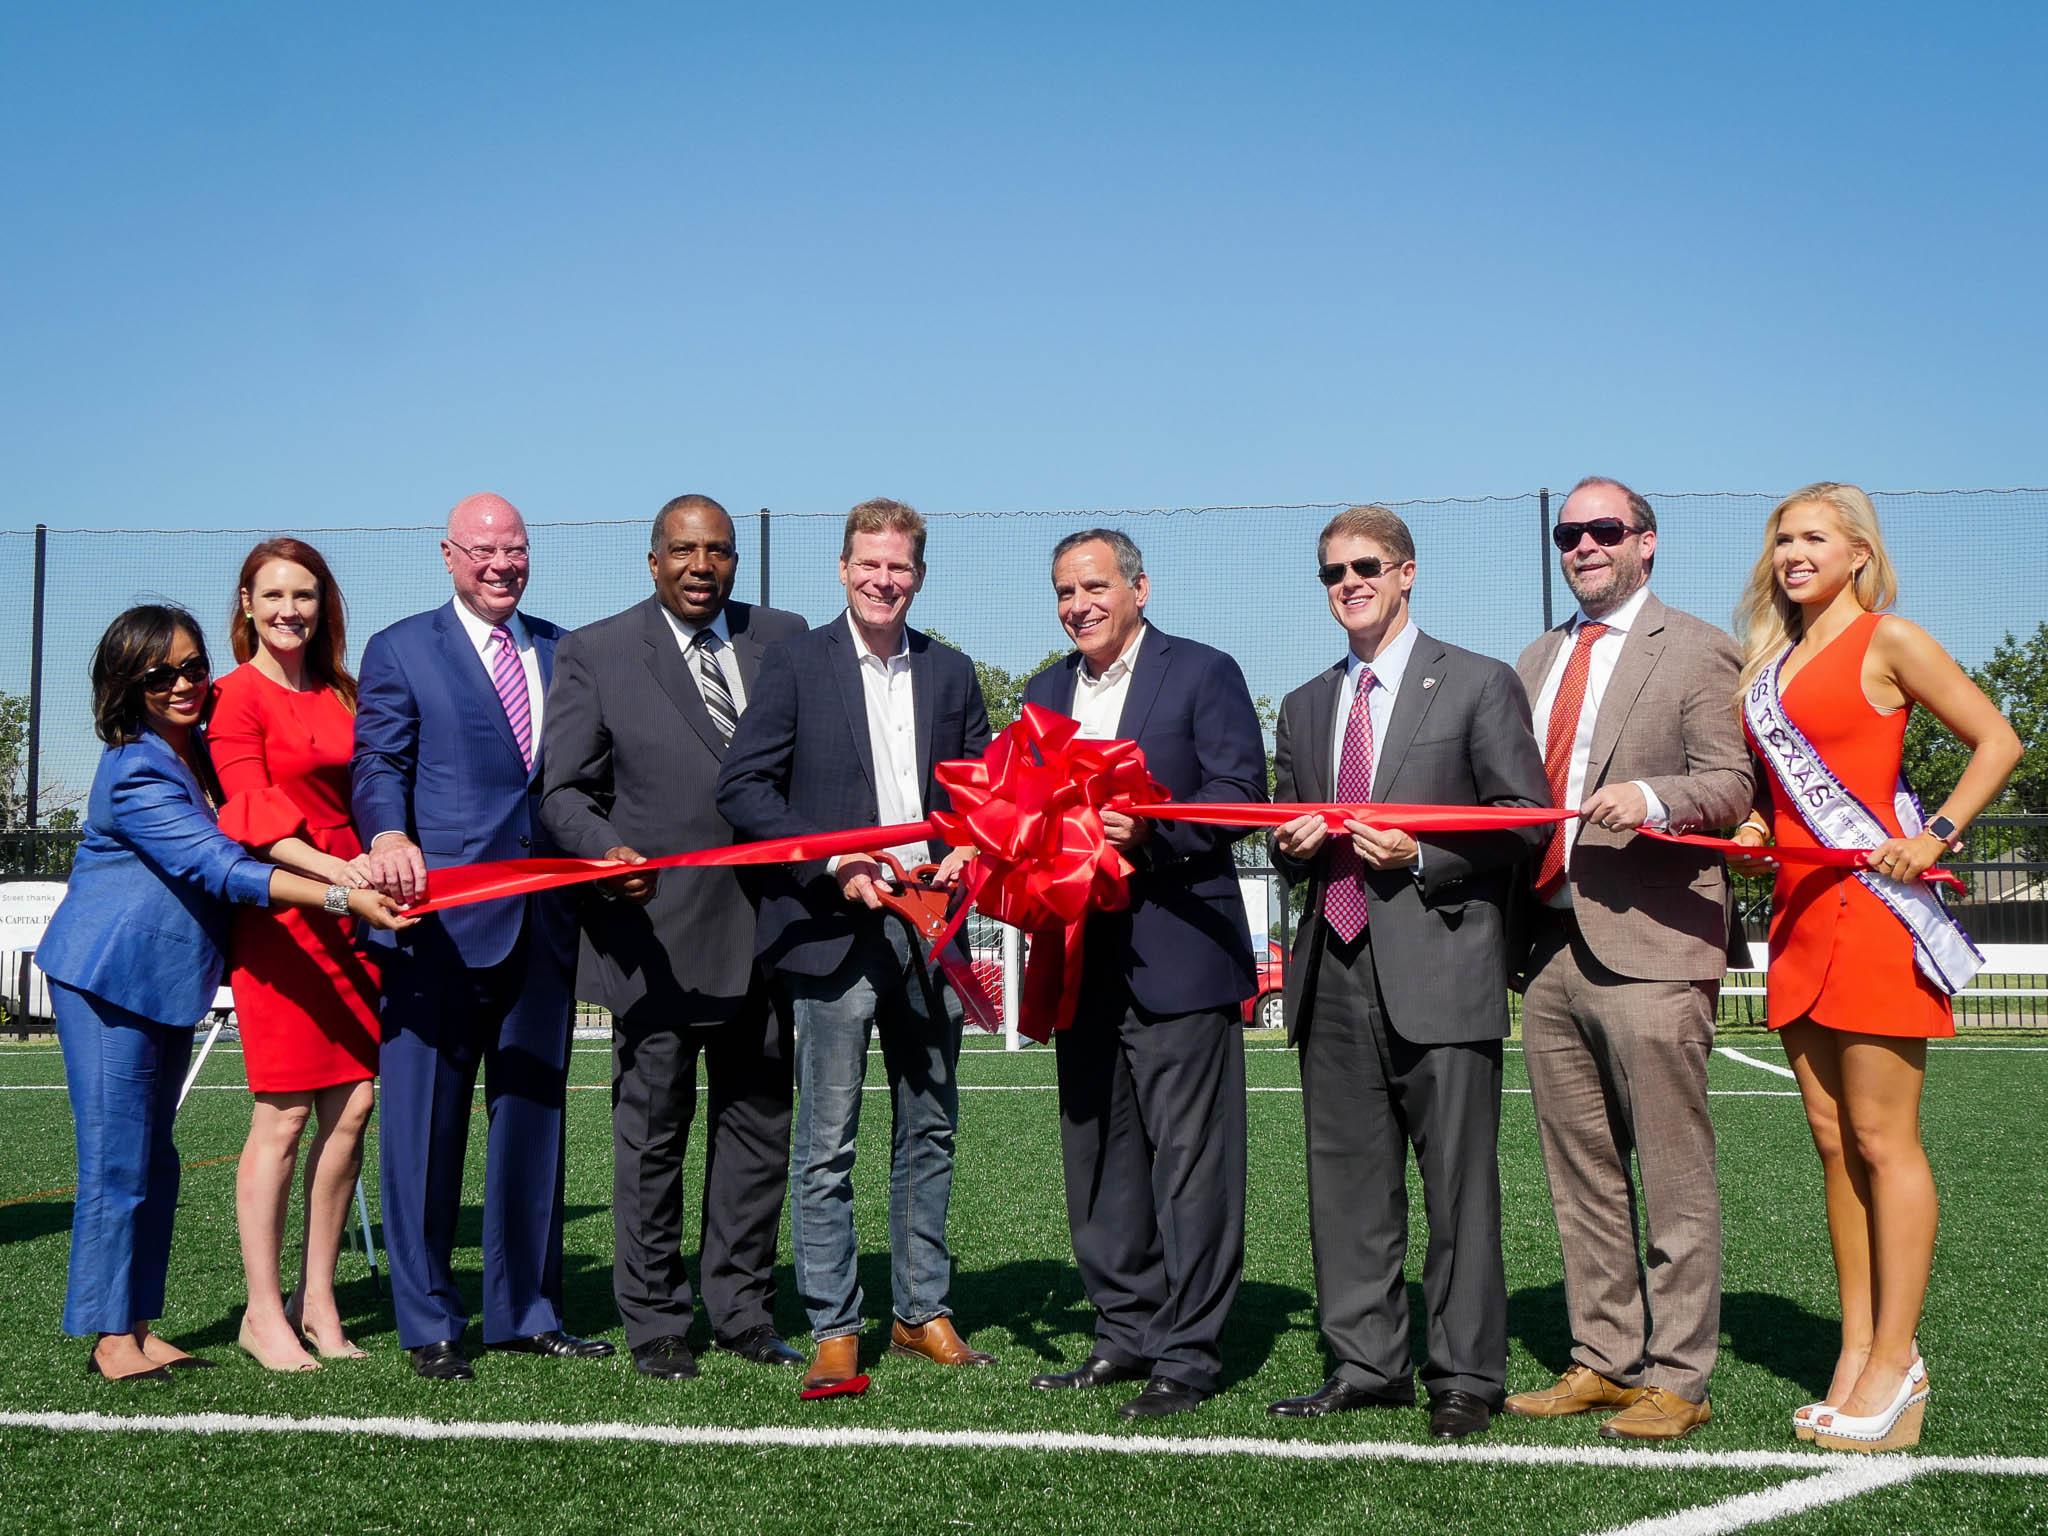 From left to right: Effie Dennison (TCB), Jamie Byum (ETP), Keith Cargill (TCB), Senator Royce West, Trey Hill (Mercy Street), Chris Curia (ETP), Clark Hunt (FC Dallas), Dan Hunt, Gracie Hunt